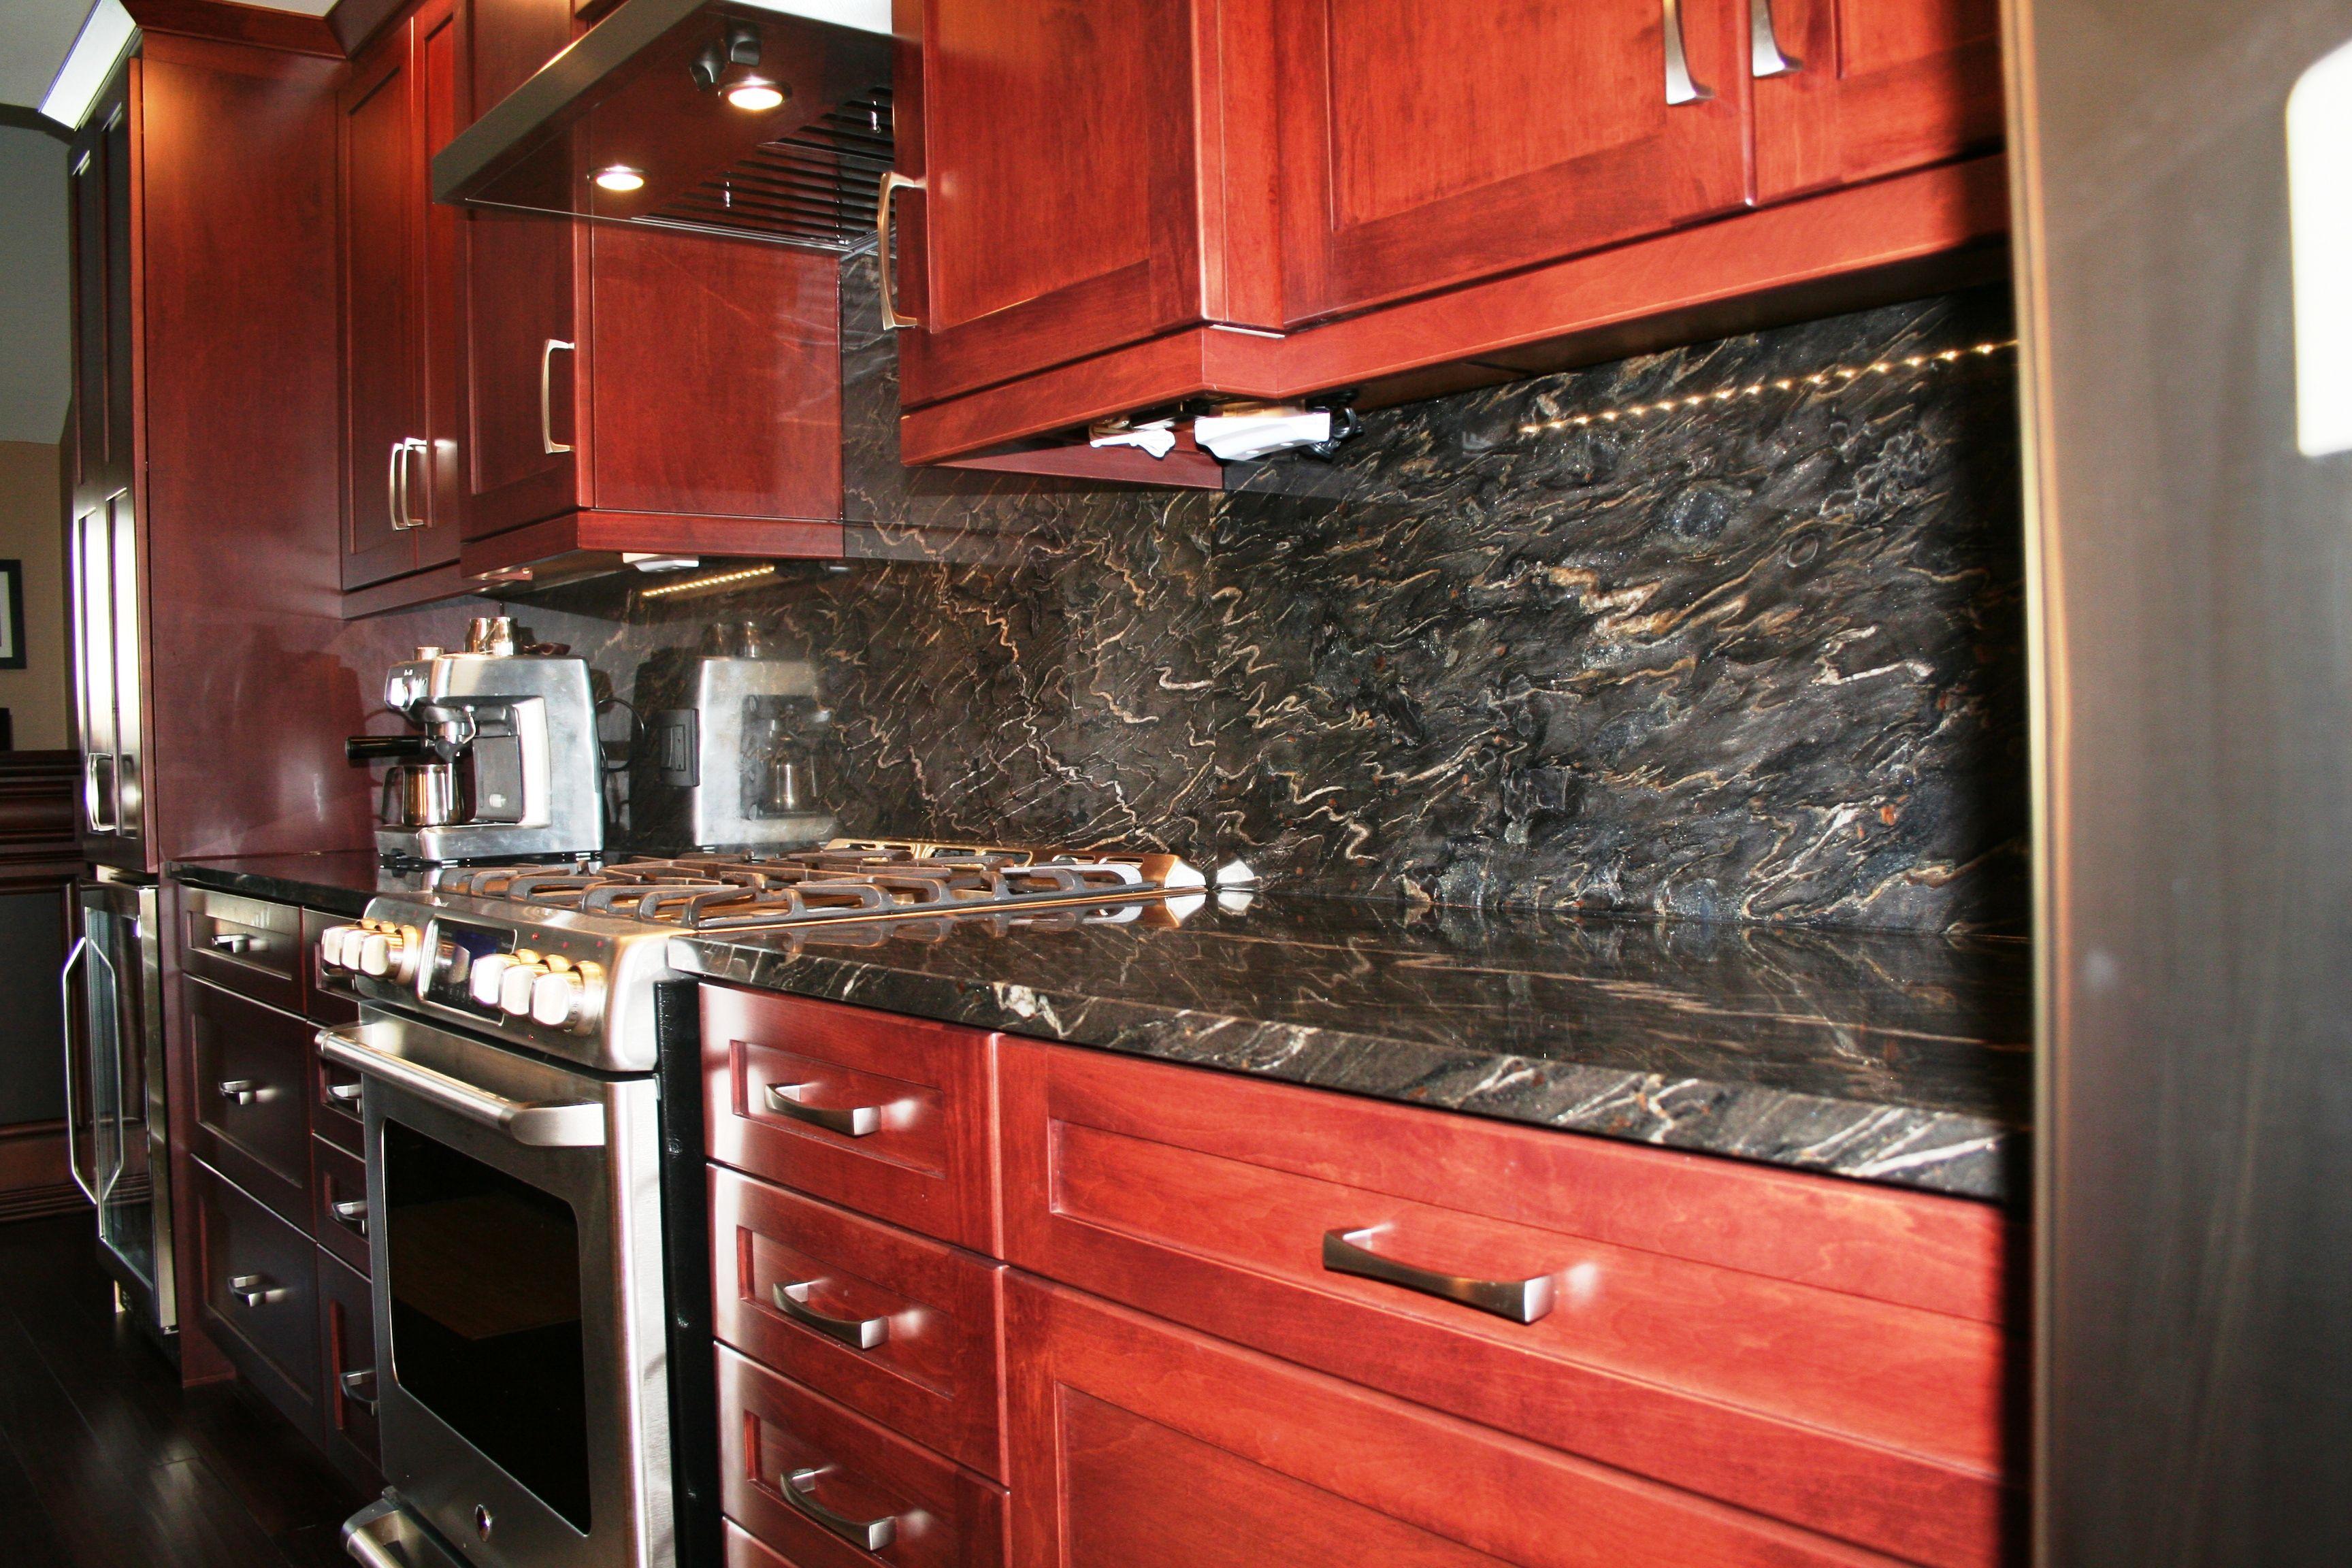 Kitchen corner cabinets windsor ontario - Granite Windsor Ontario Twilight Granite Kitchen Countertop And Full Backsplash Dimanti Stone Works